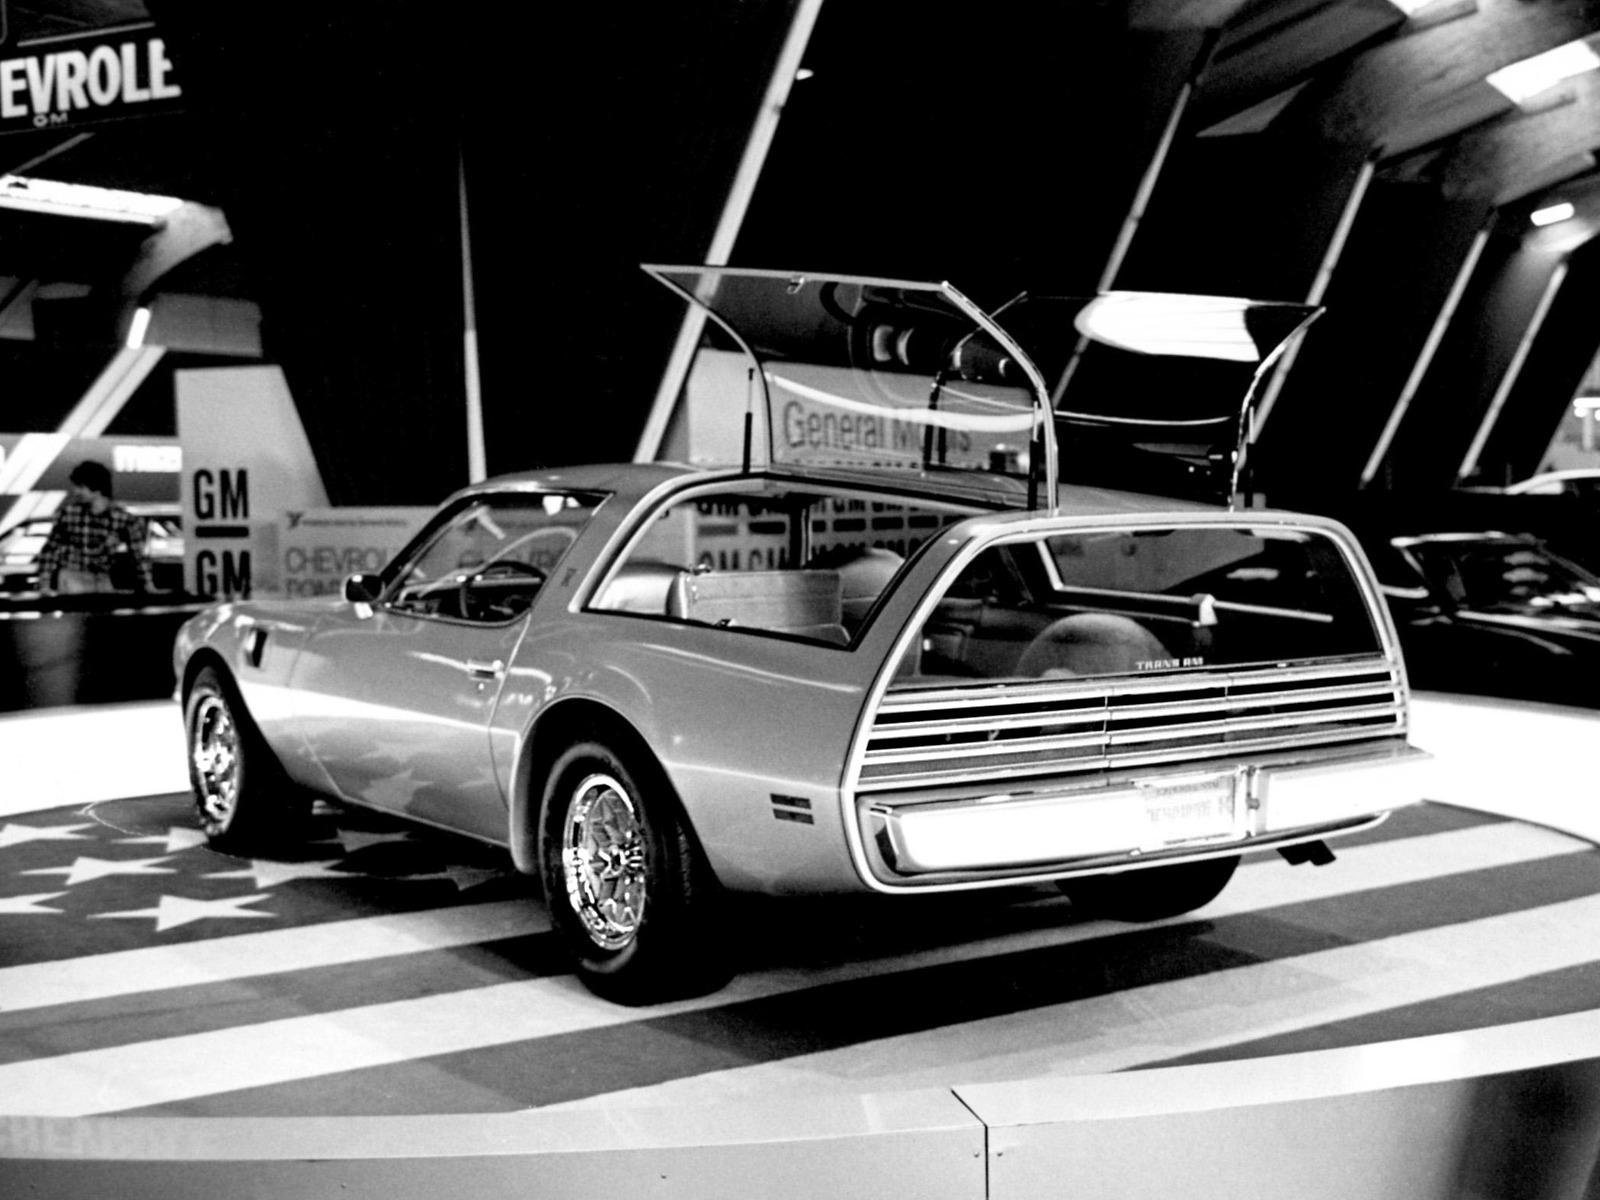 Pontiac Firebird Trans Am Type K Concept (1977) – Old Concept Cars